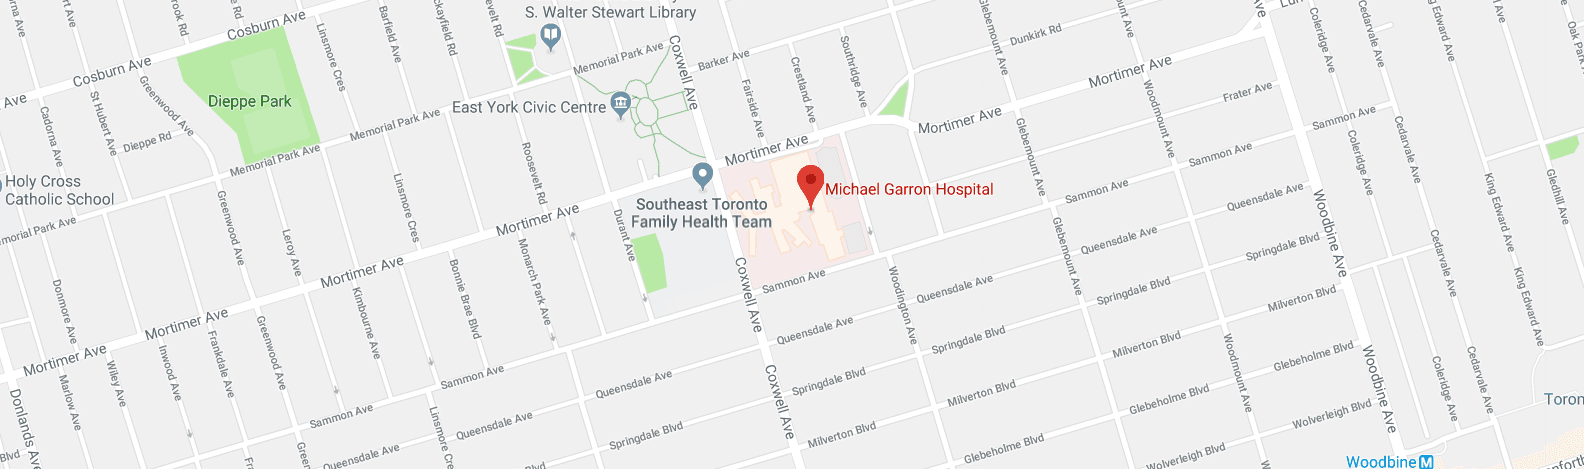 michael garron hospital map